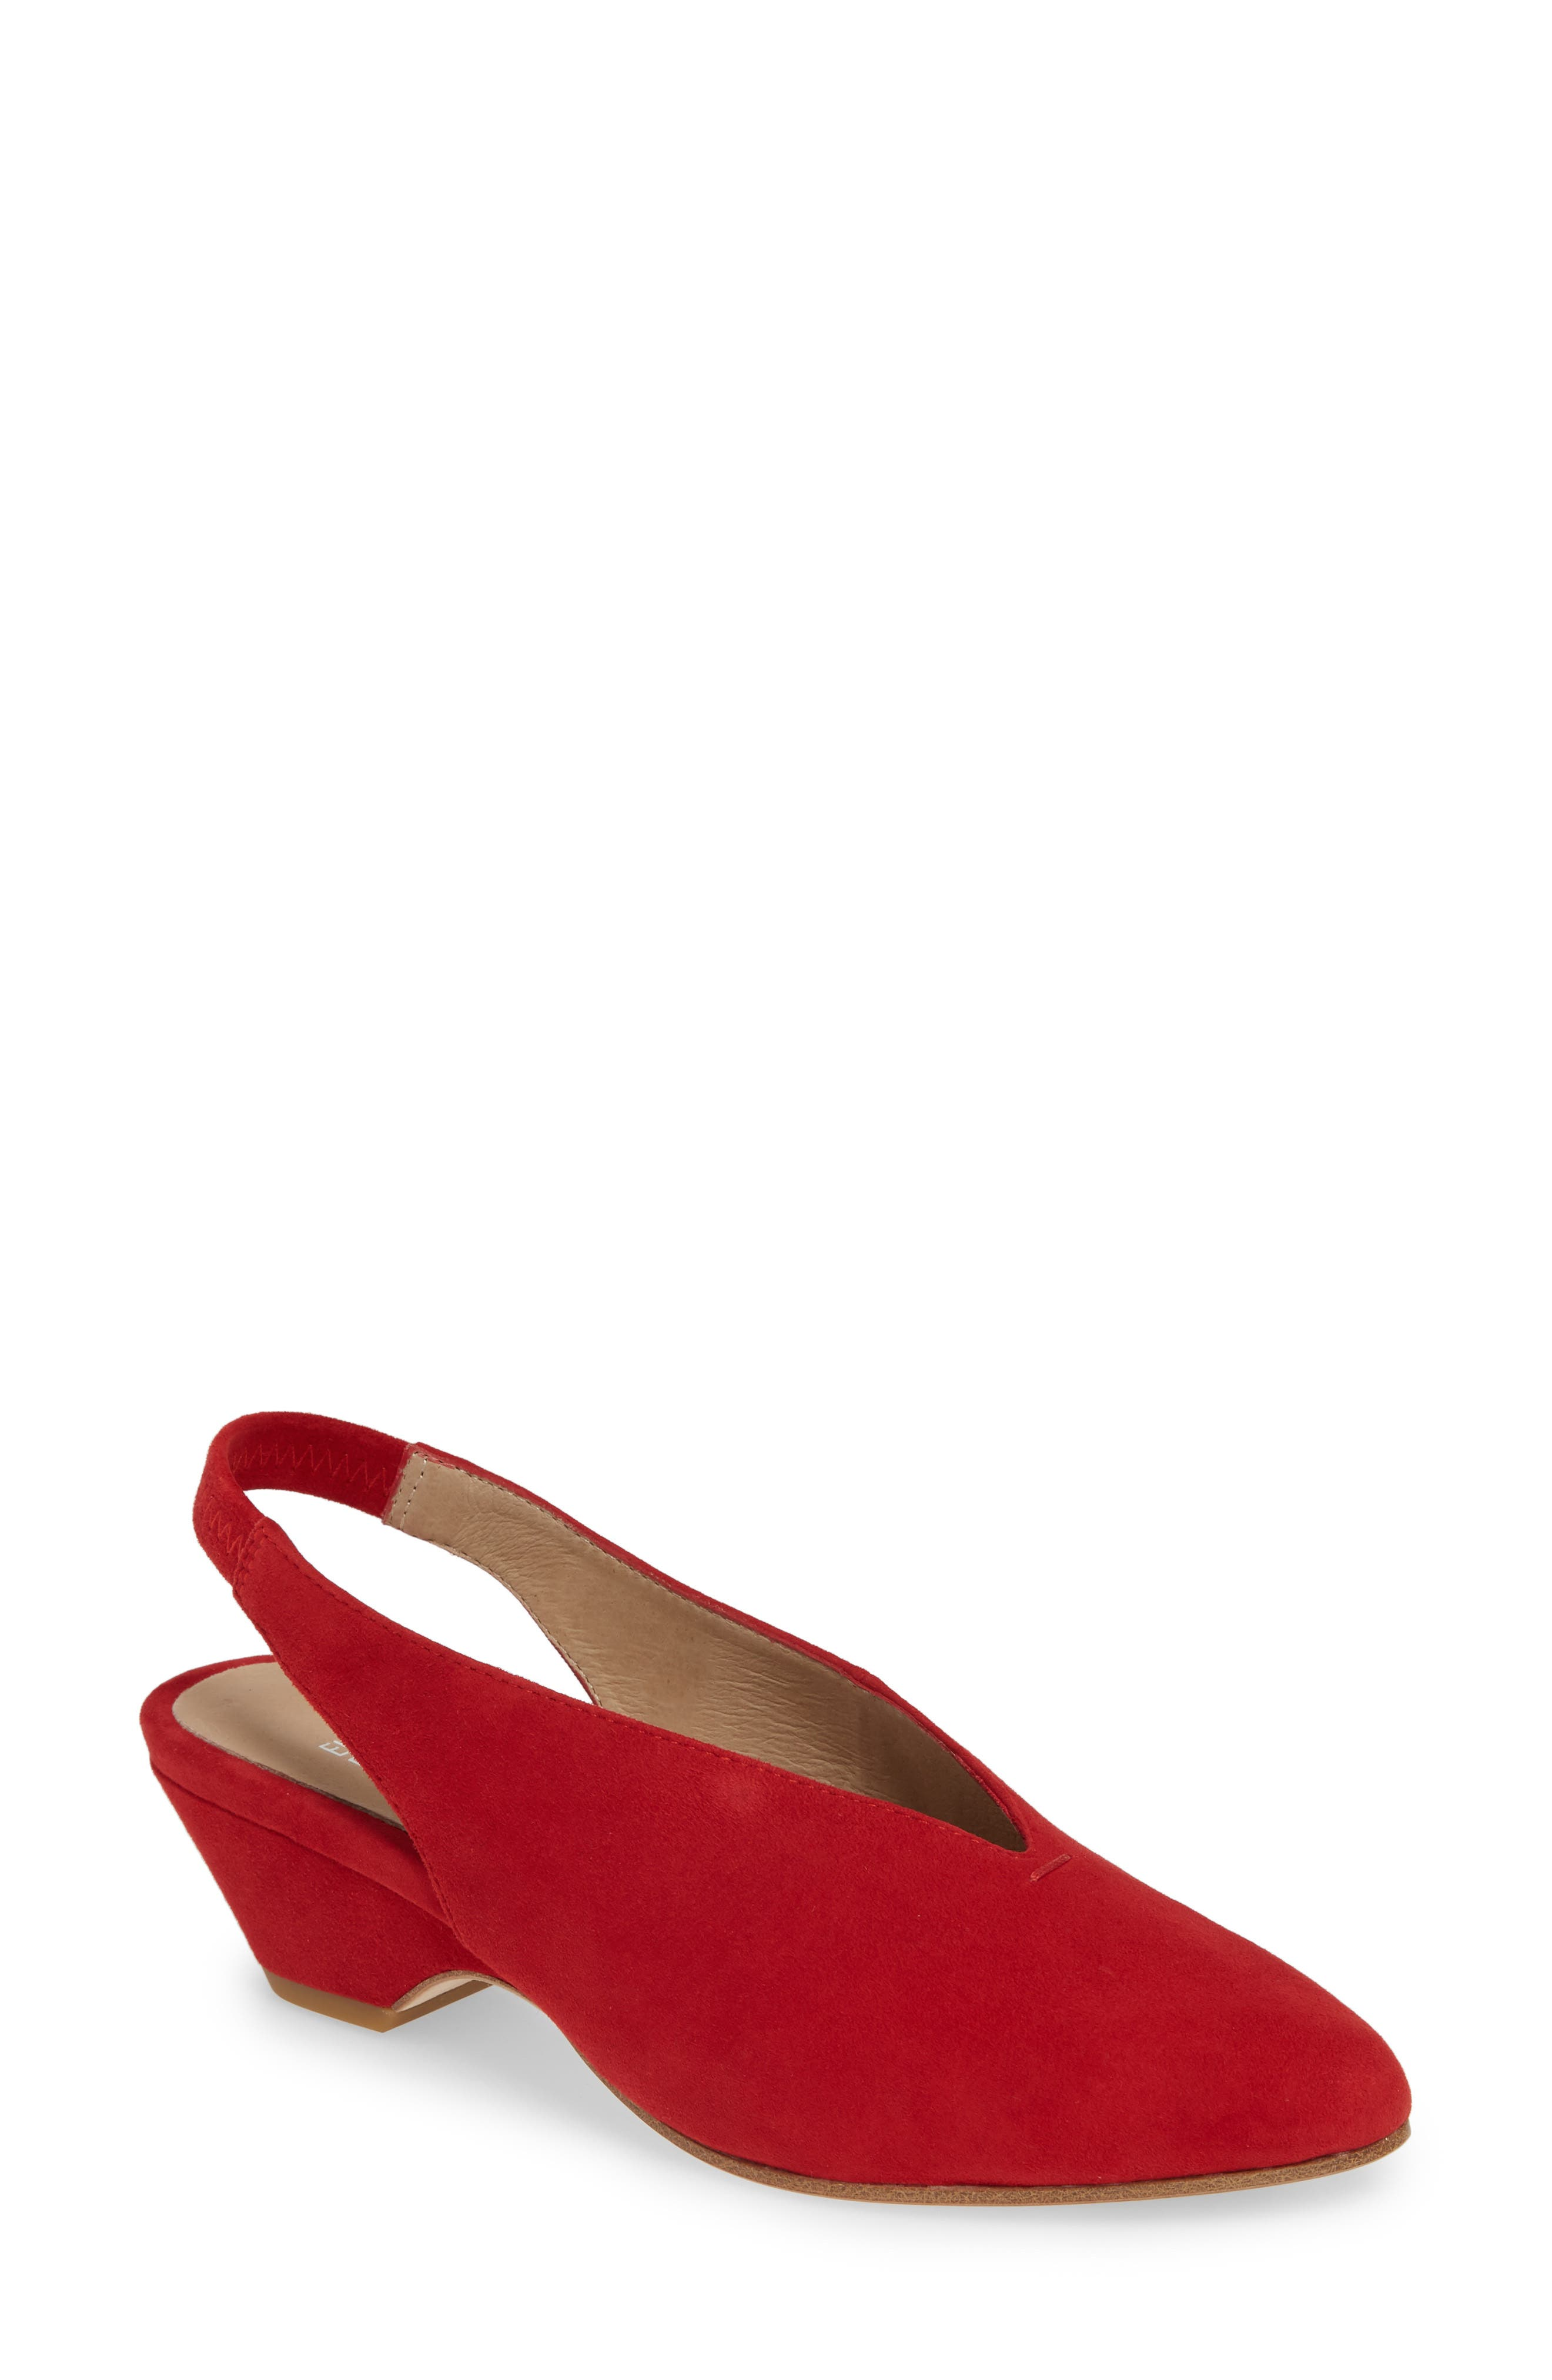 Eileen Fisher Gatwick Slingback Pump, Red